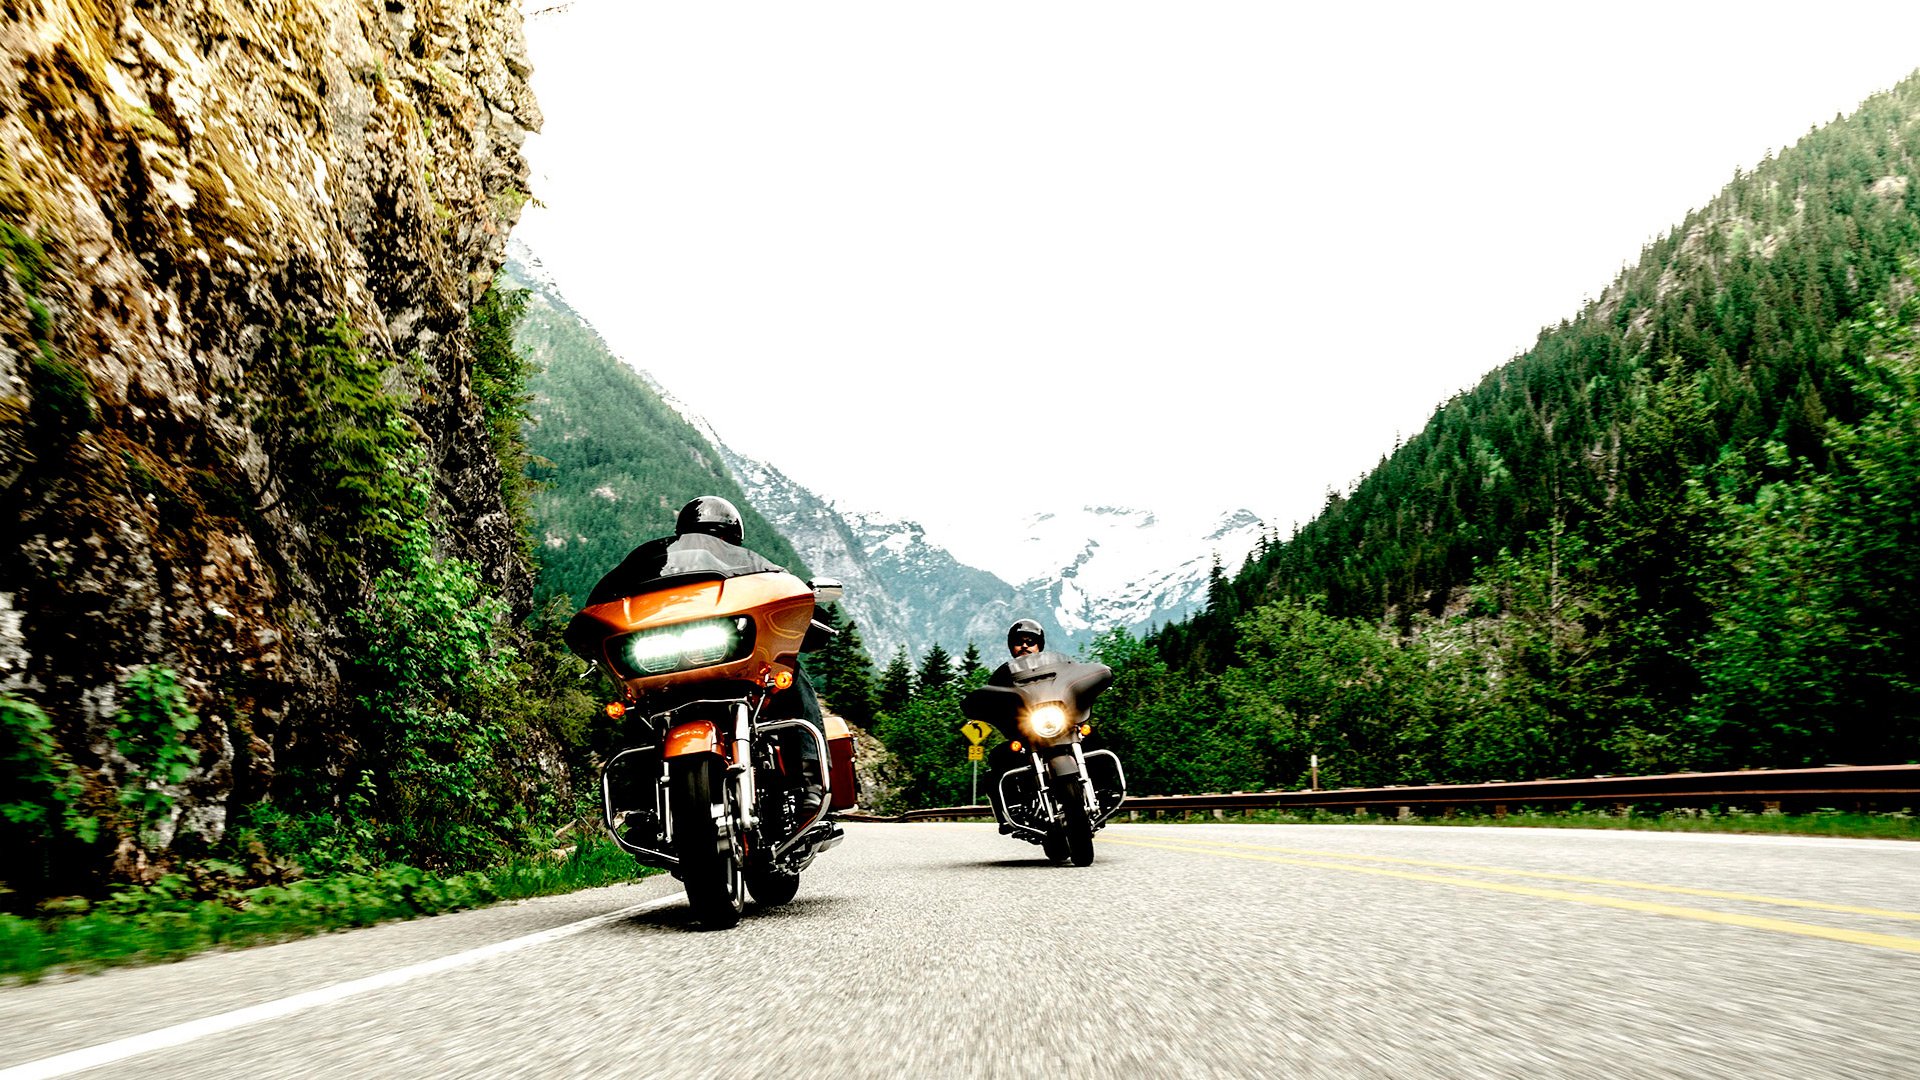 Pin Harley Davidson Road Glide 2015 on Pinterest